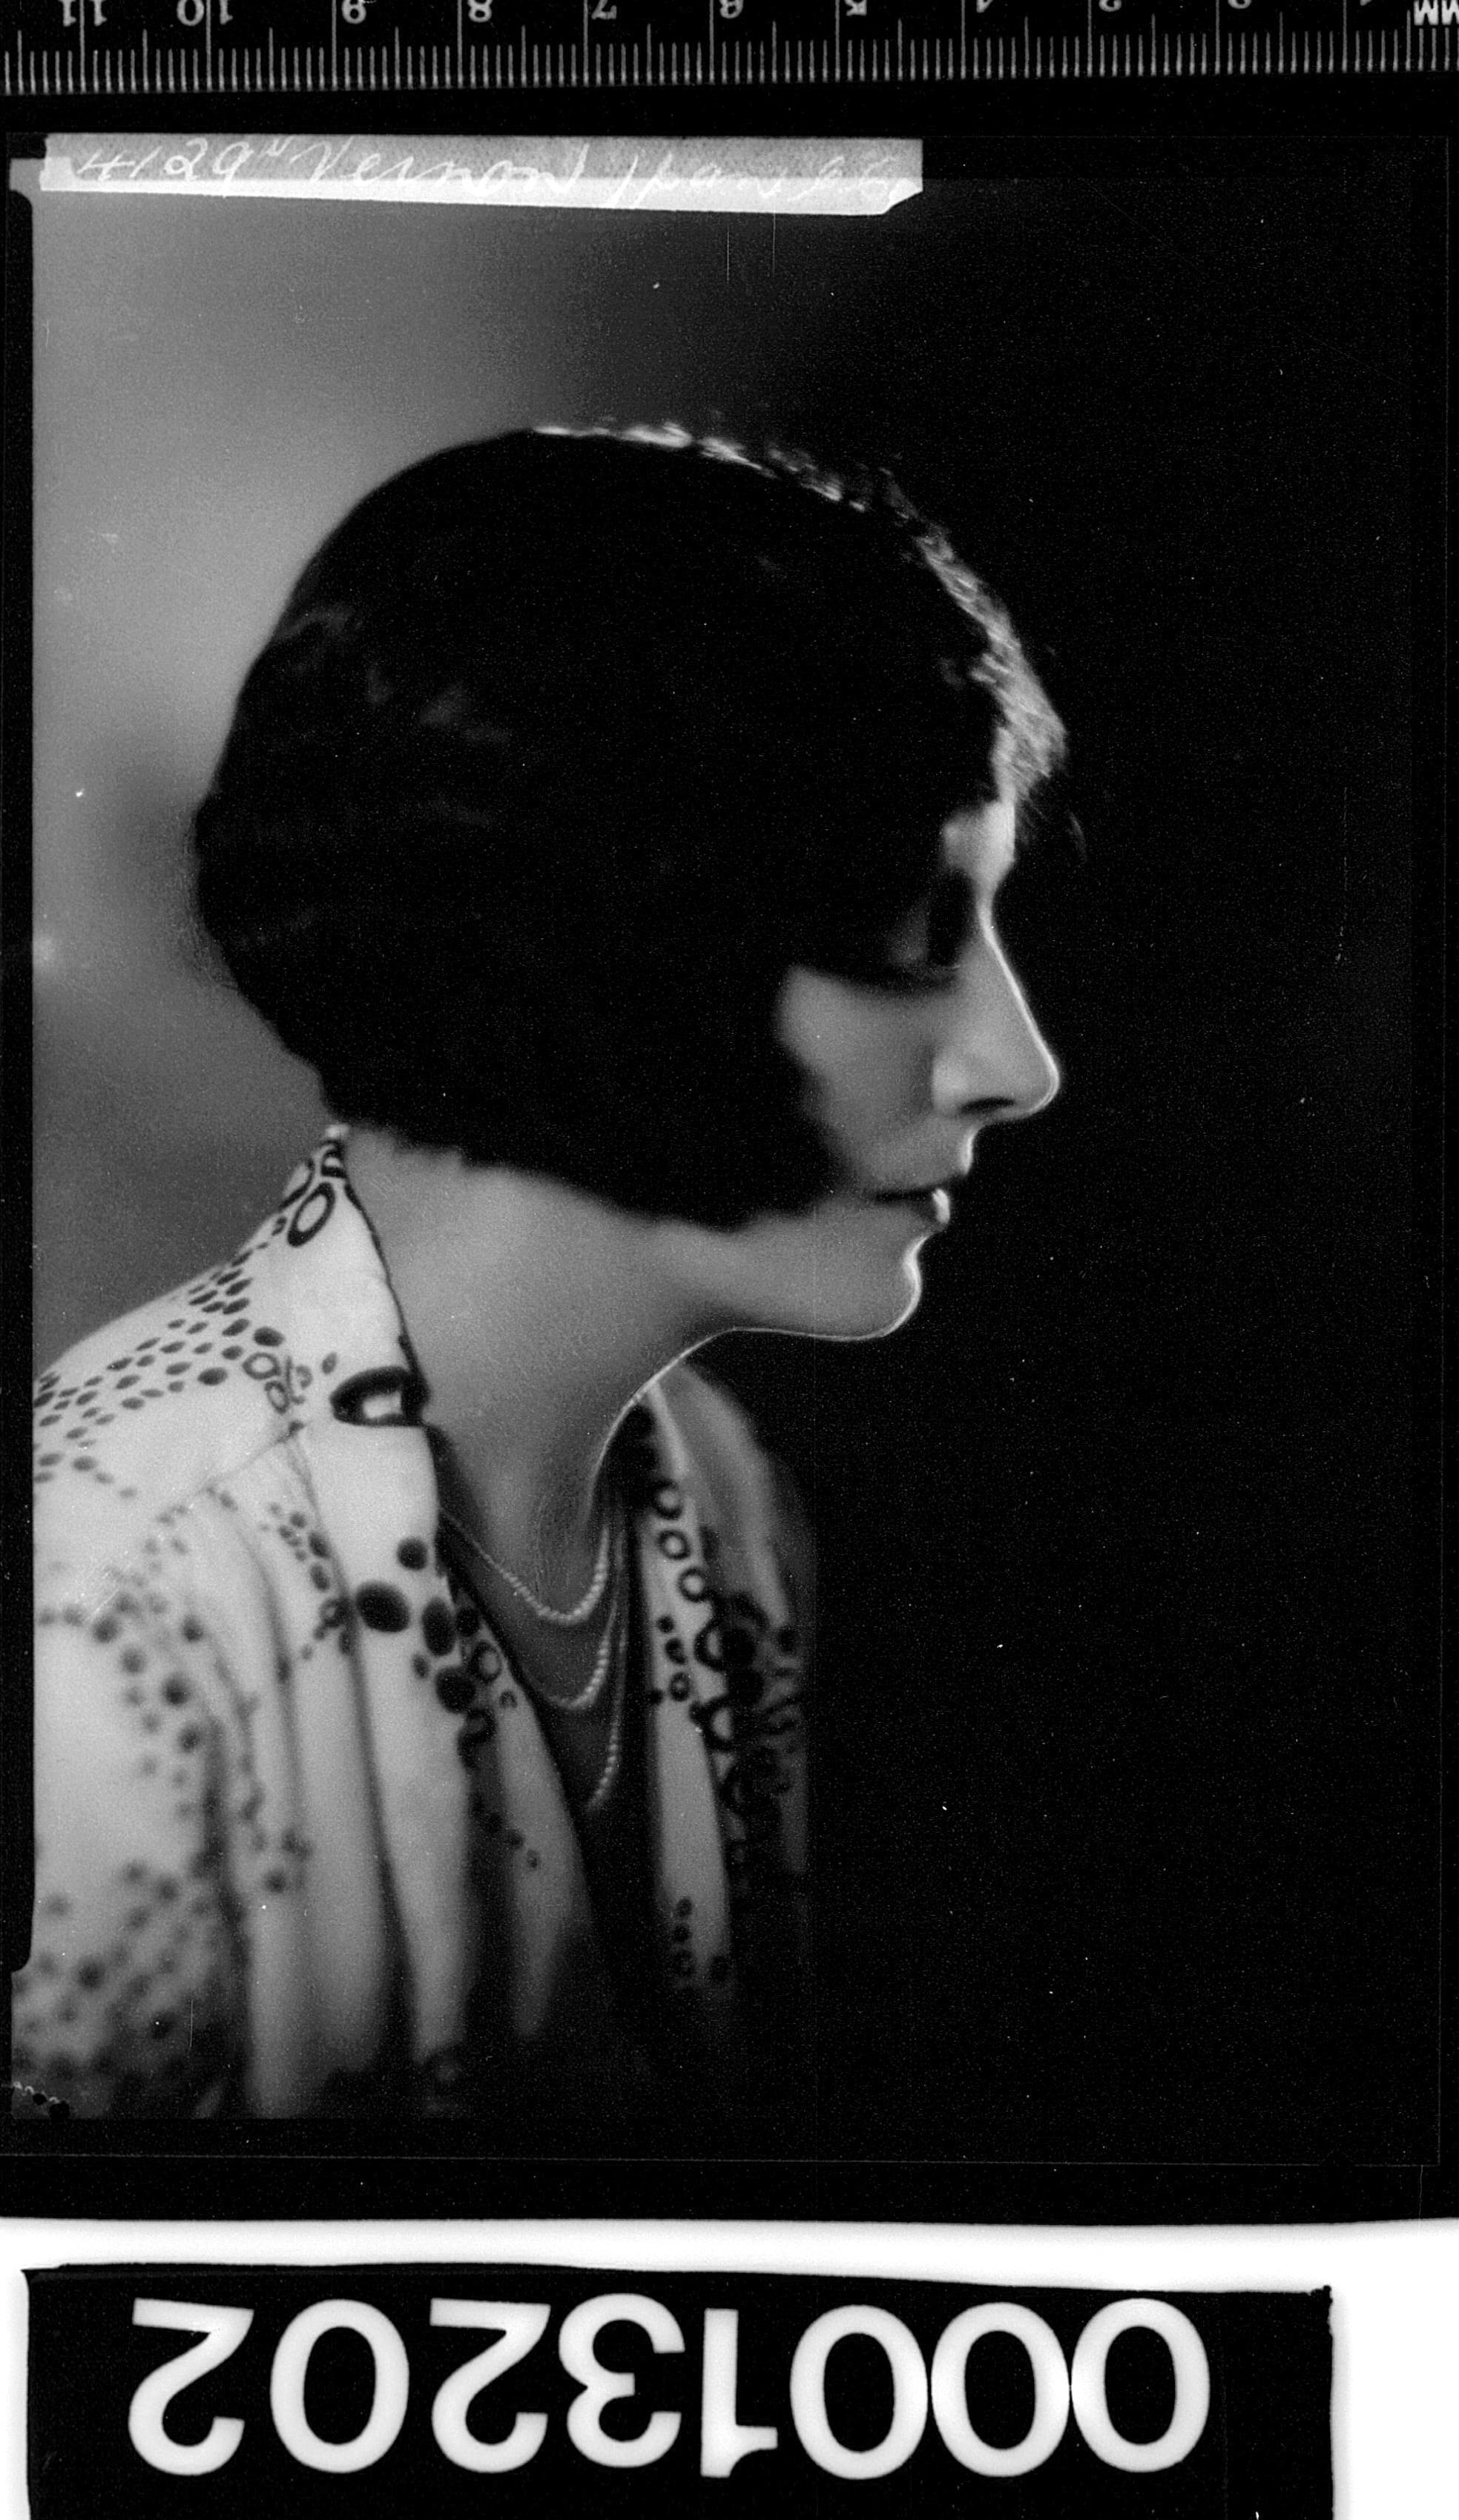 Portrait of singer Miss Patsy / Patsie Hill